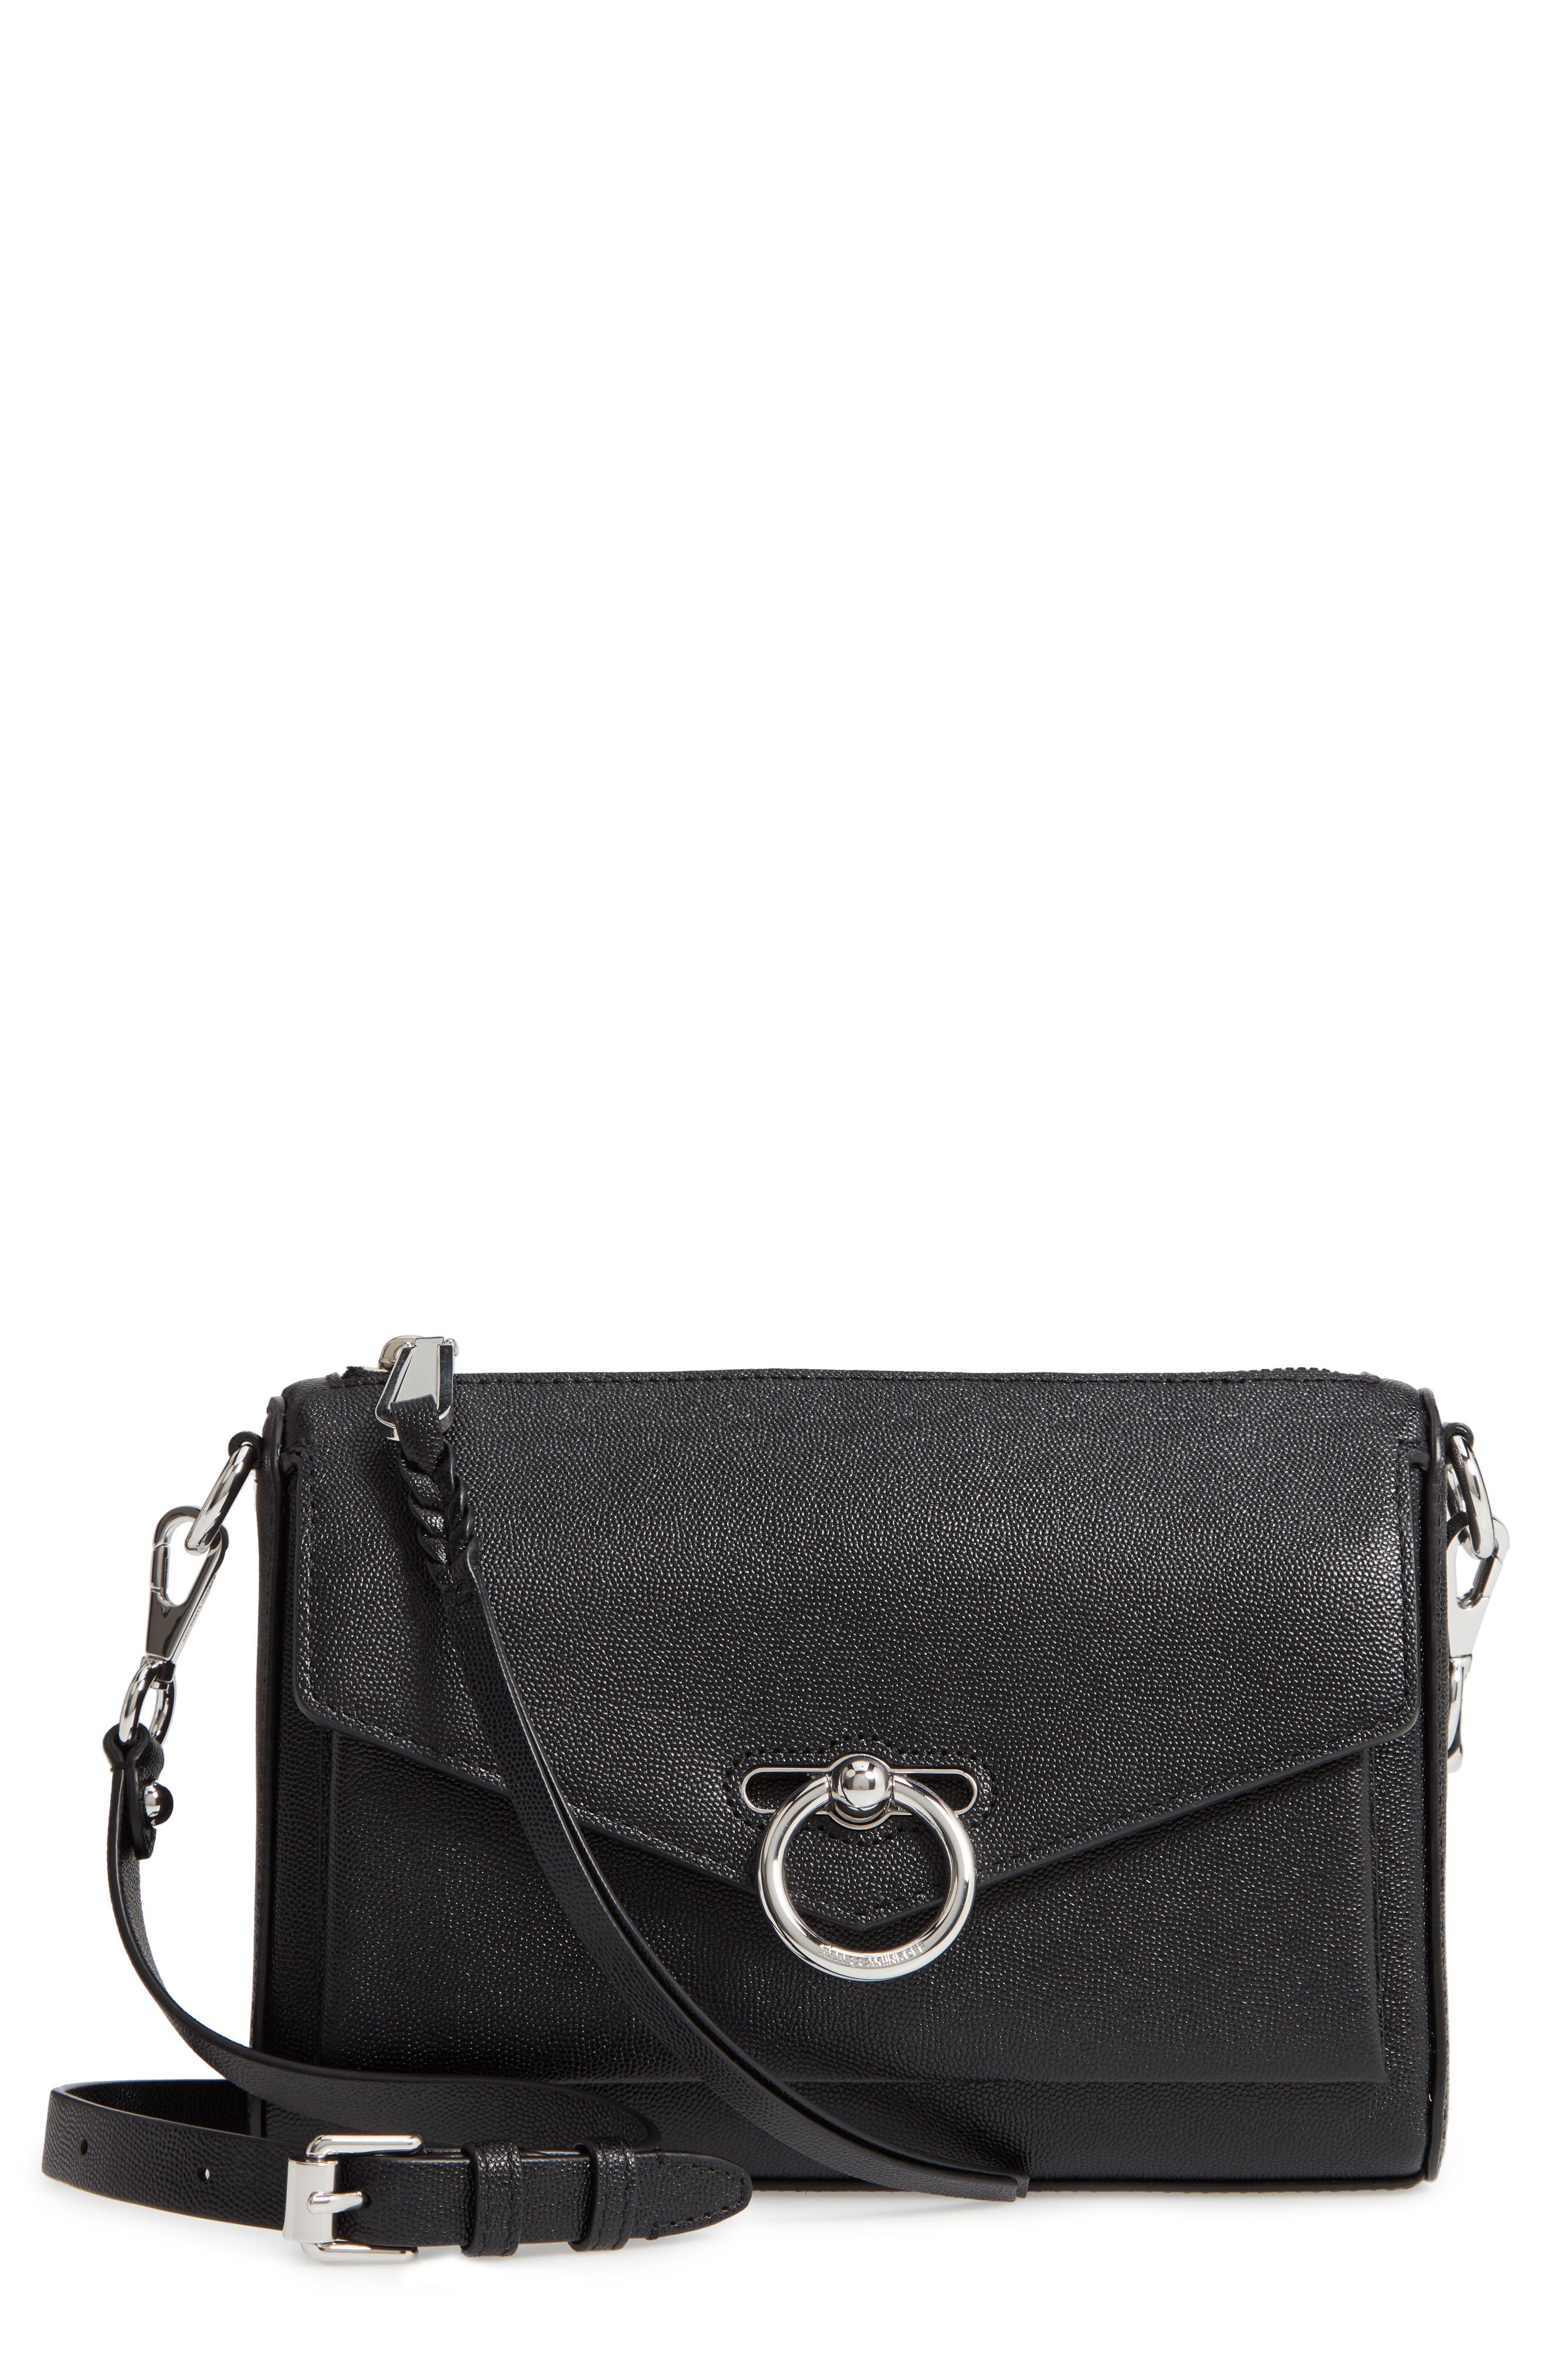 Jean MAC Convertible Crossbody Bag, Main, color, BLACK